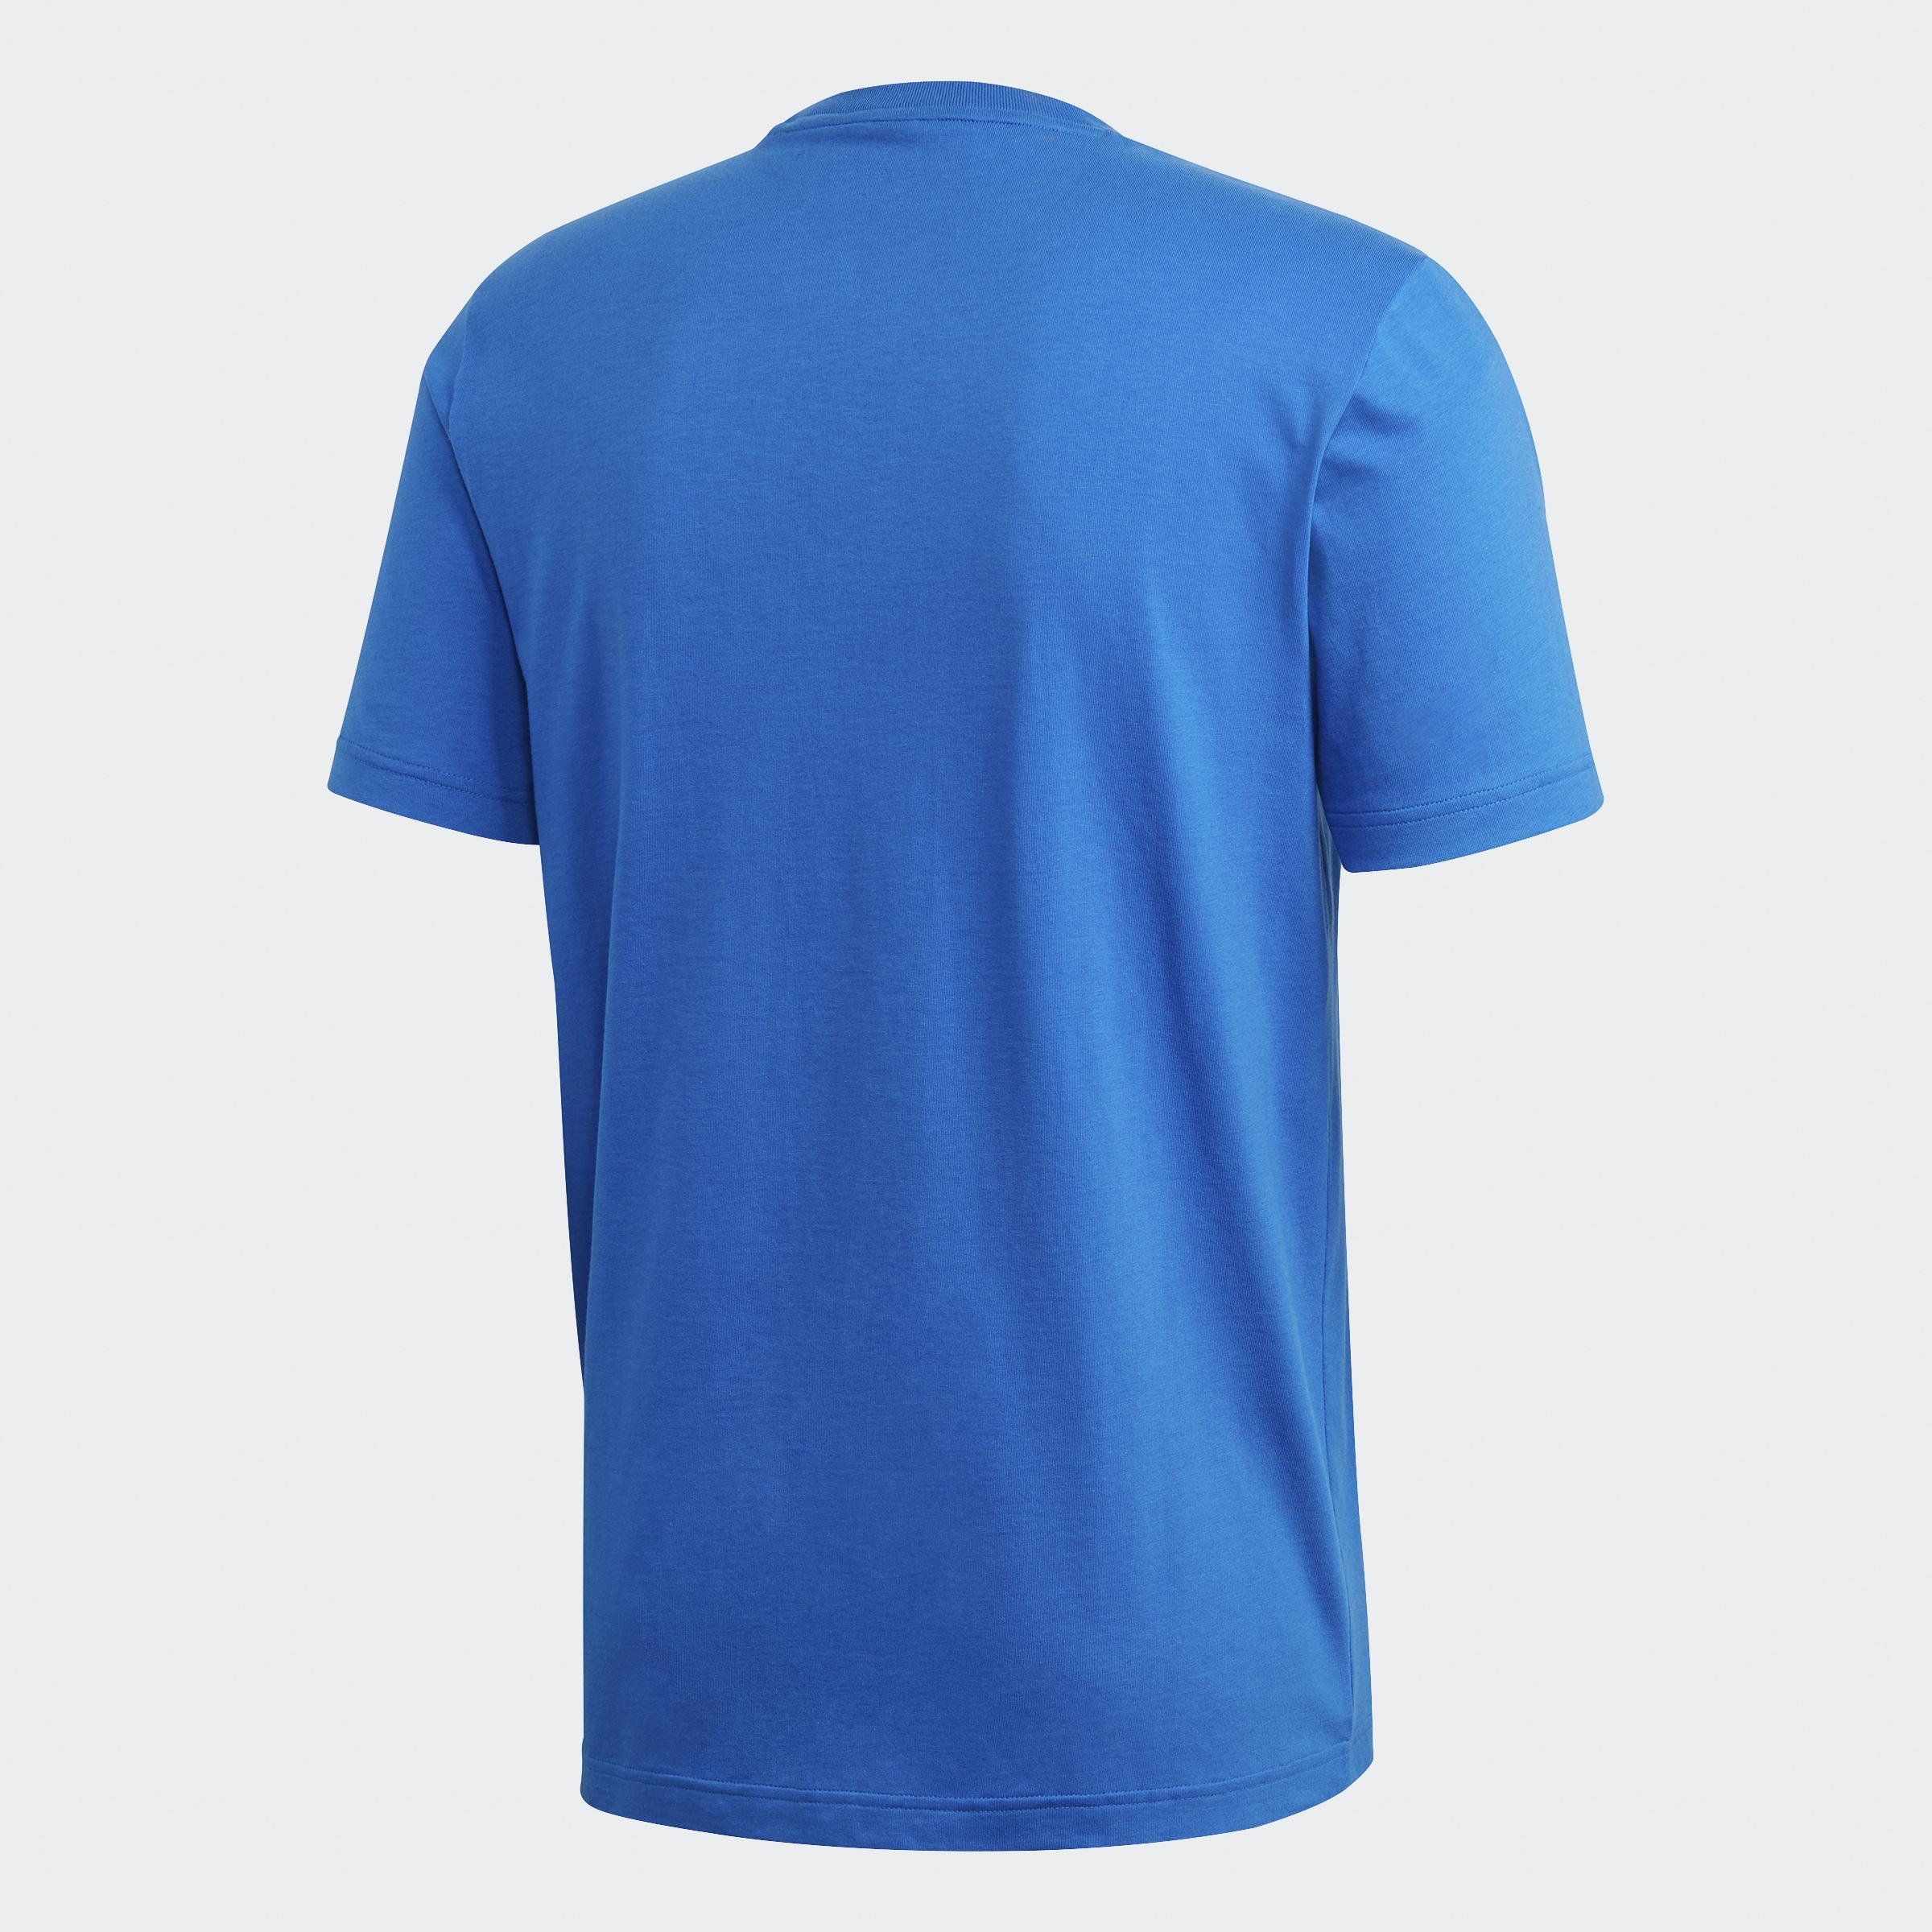 adidas-Must-Haves-Badge-of-Sport-Tee-Men-039-s-Shirts thumbnail 33